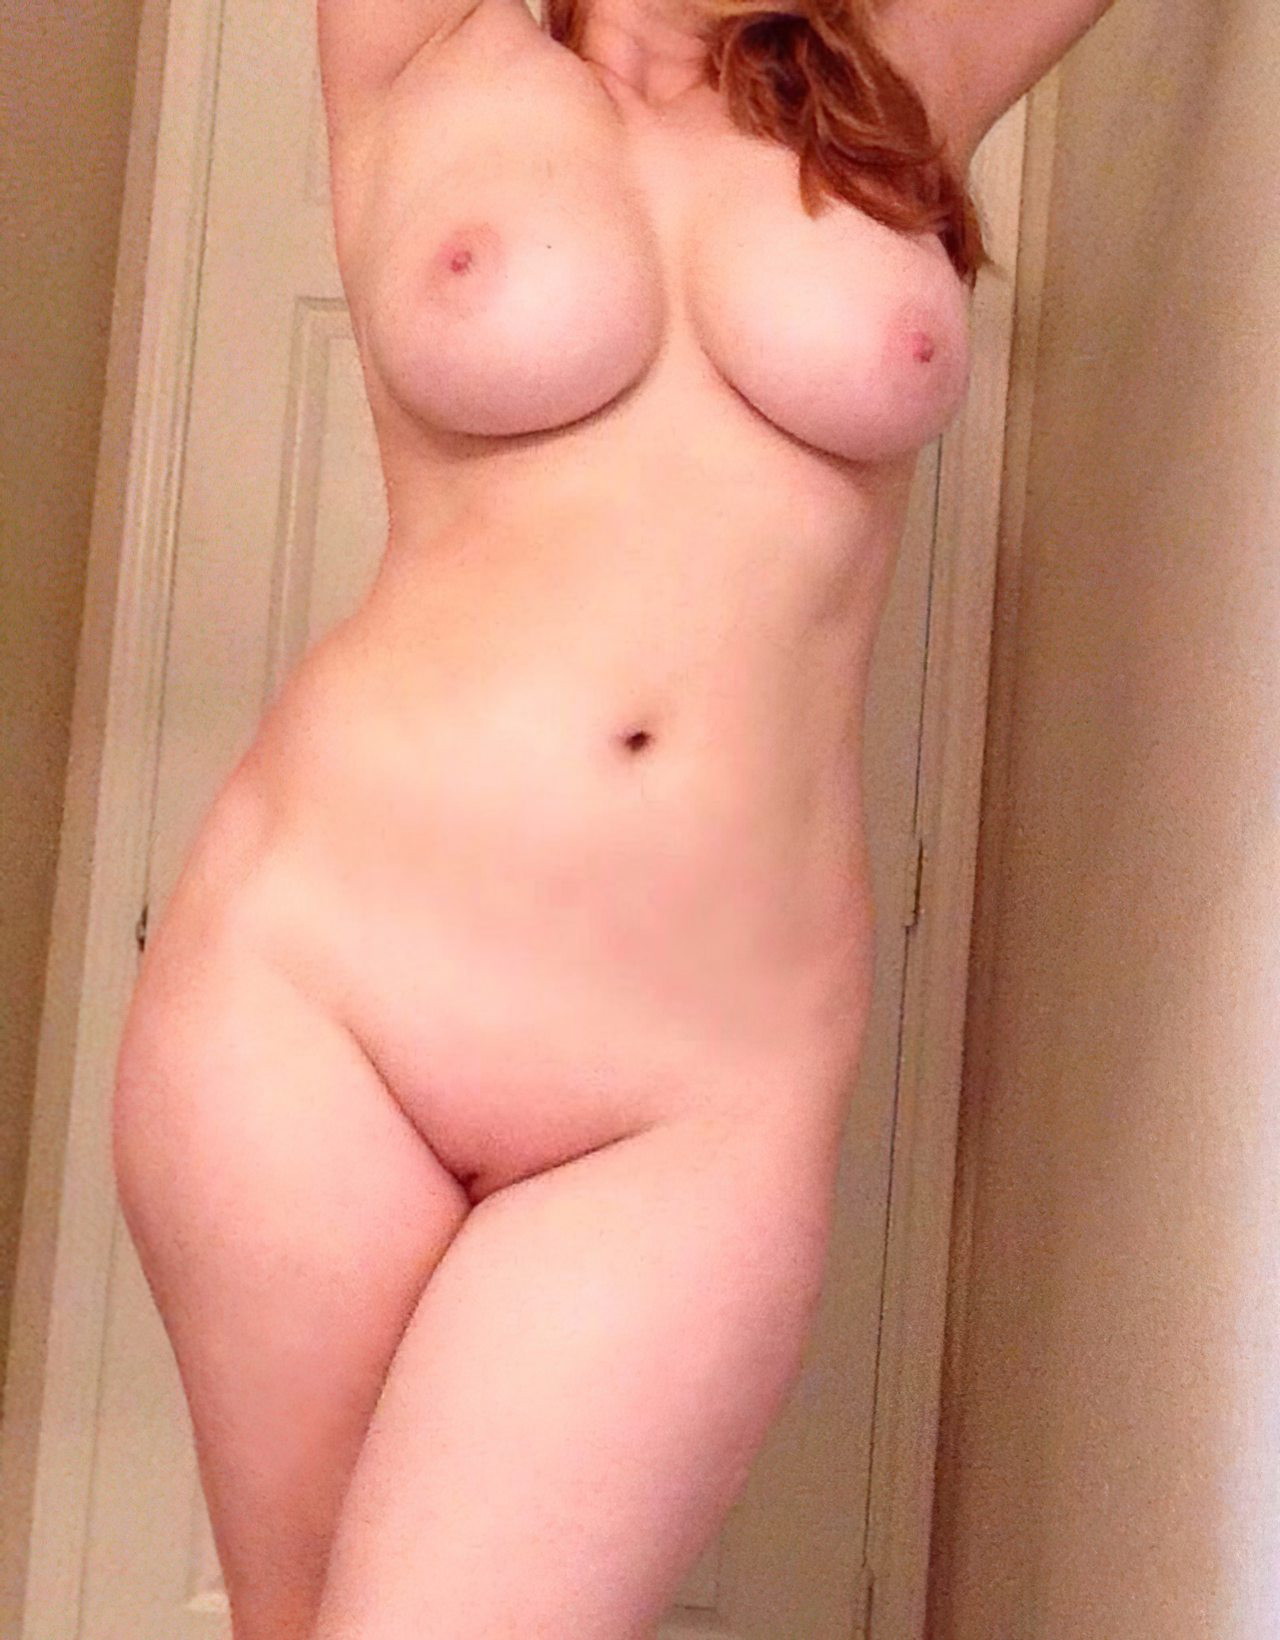 Striptease Antes de Sair (10)